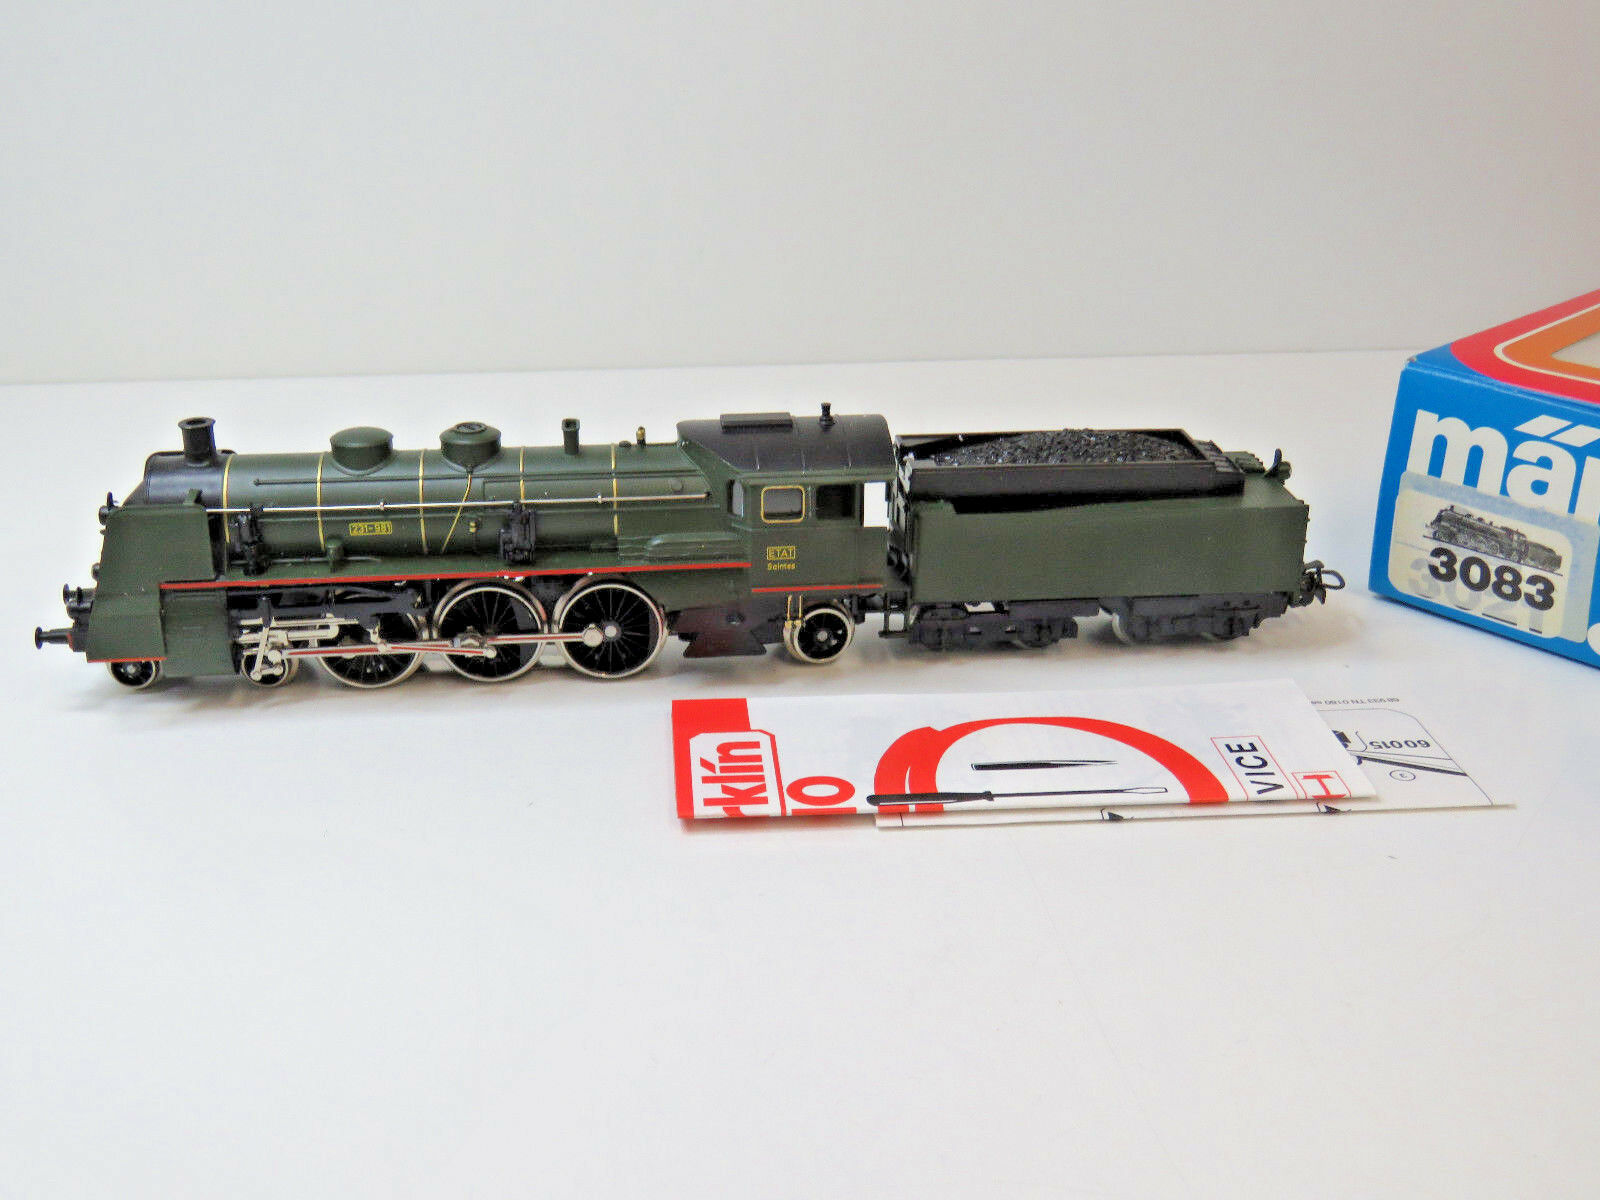 Locomotiva serie 231-981 della SNCF, Etat, Epoca III,   HO, 3083,ovp, WS